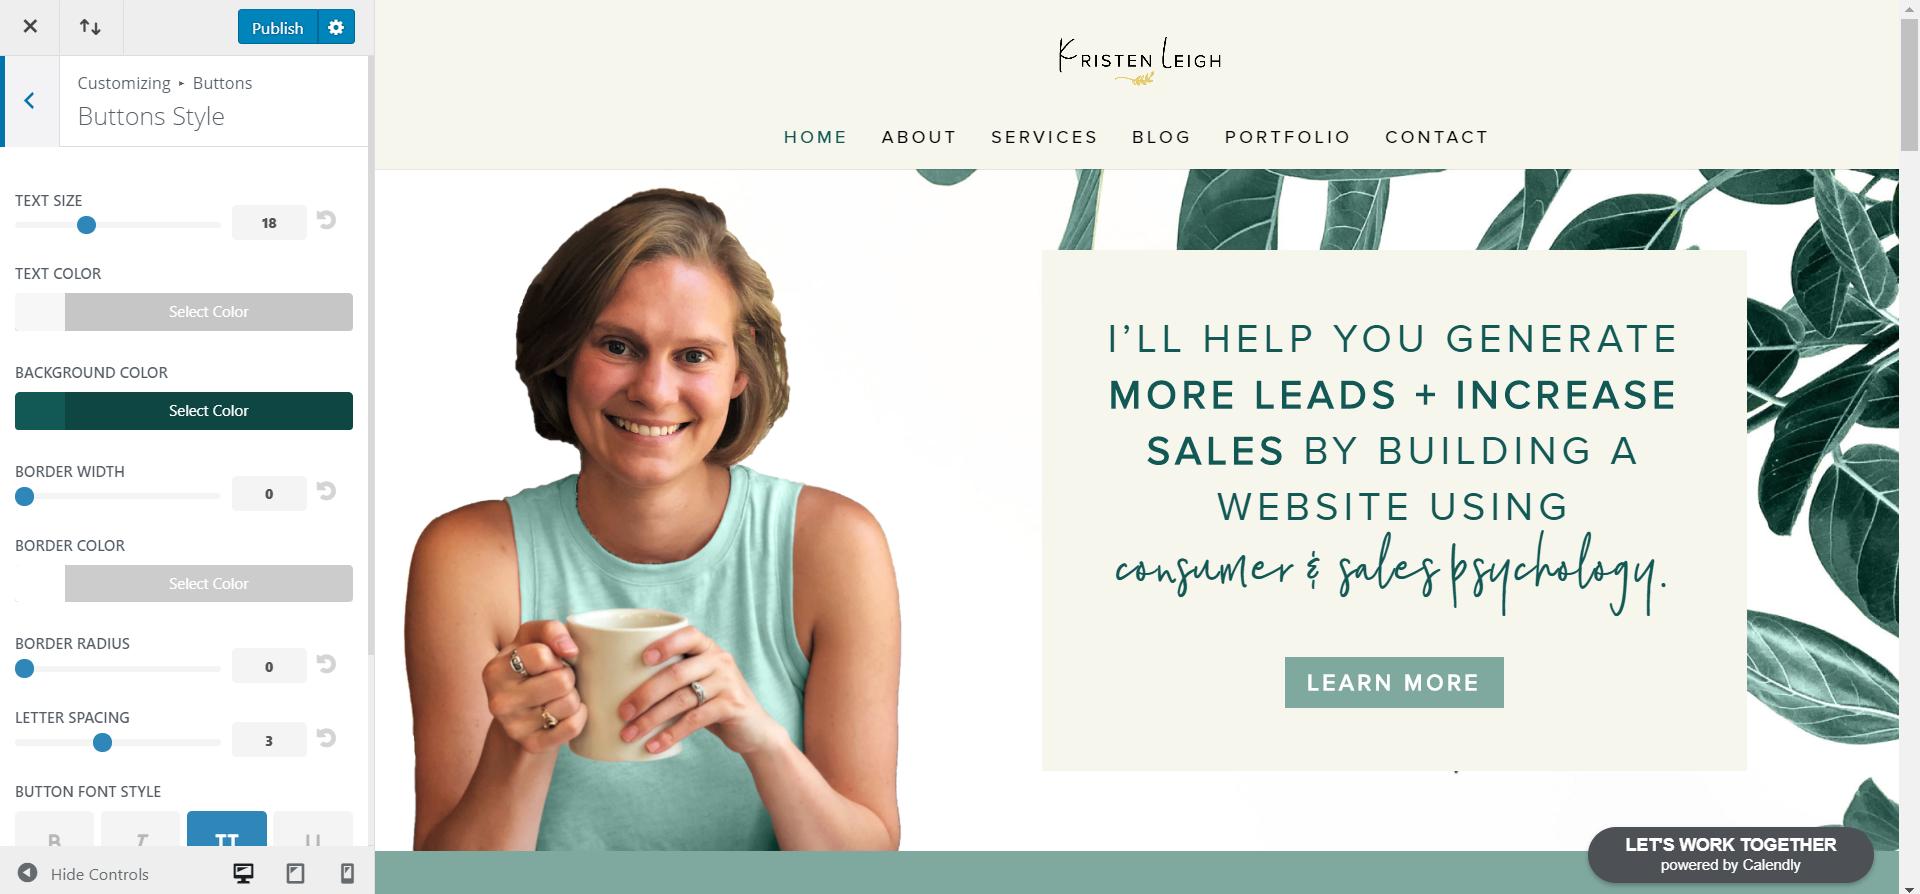 Kristen Leigh | Web Design Studio | How to Quickly Build a Divi Website | Button Styles